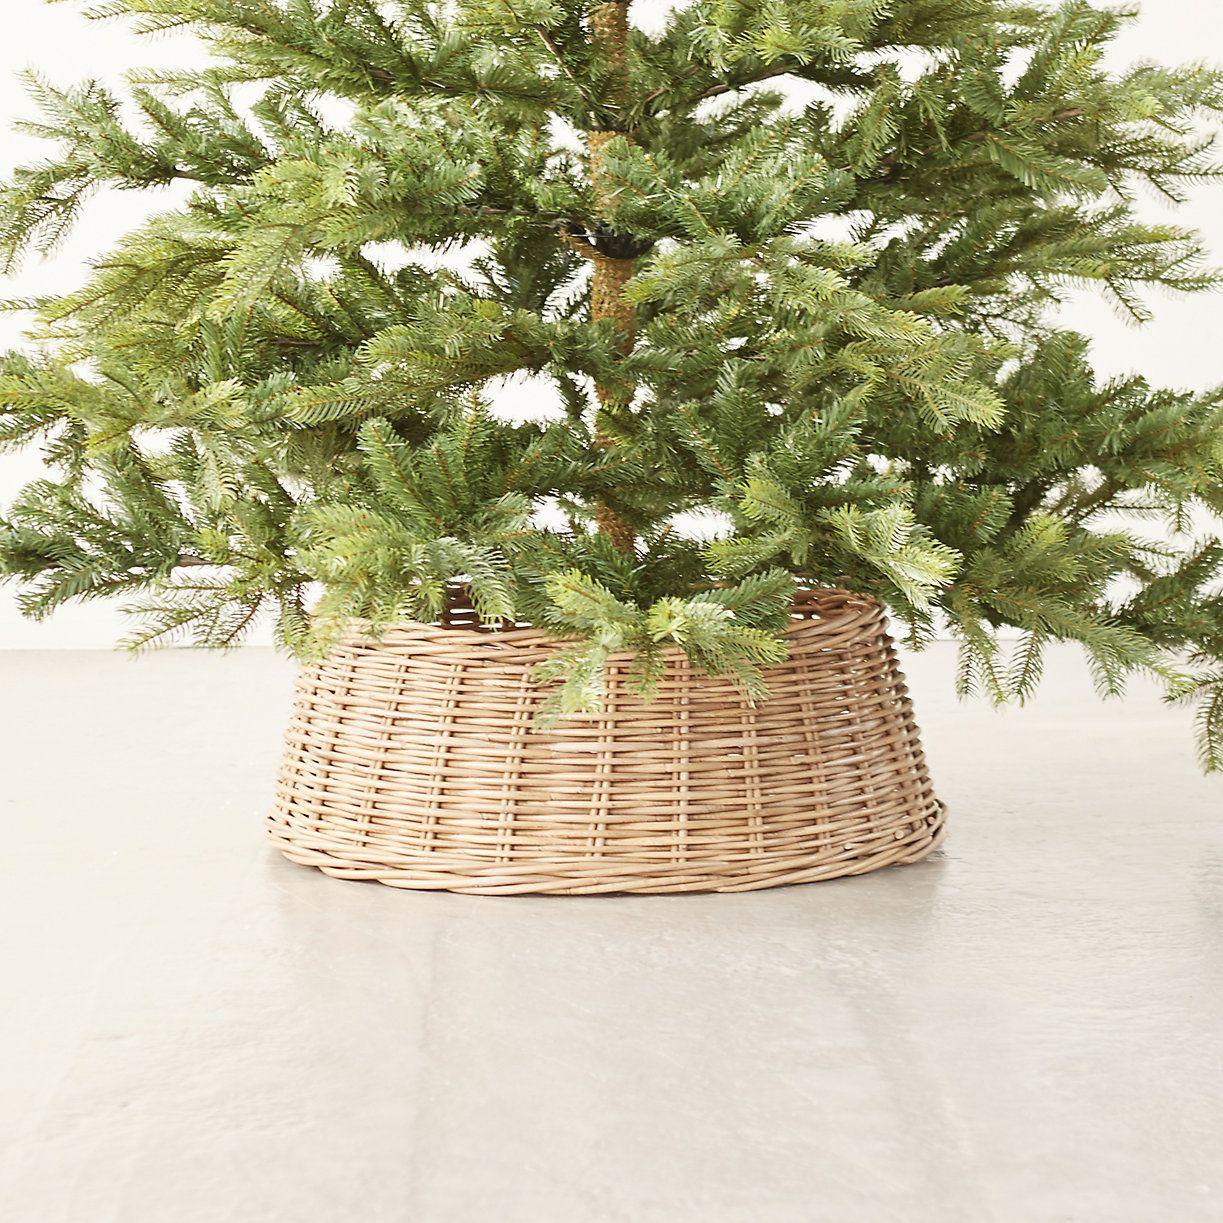 Wicker Basket Tree Skirt Christmas tree in basket, Best